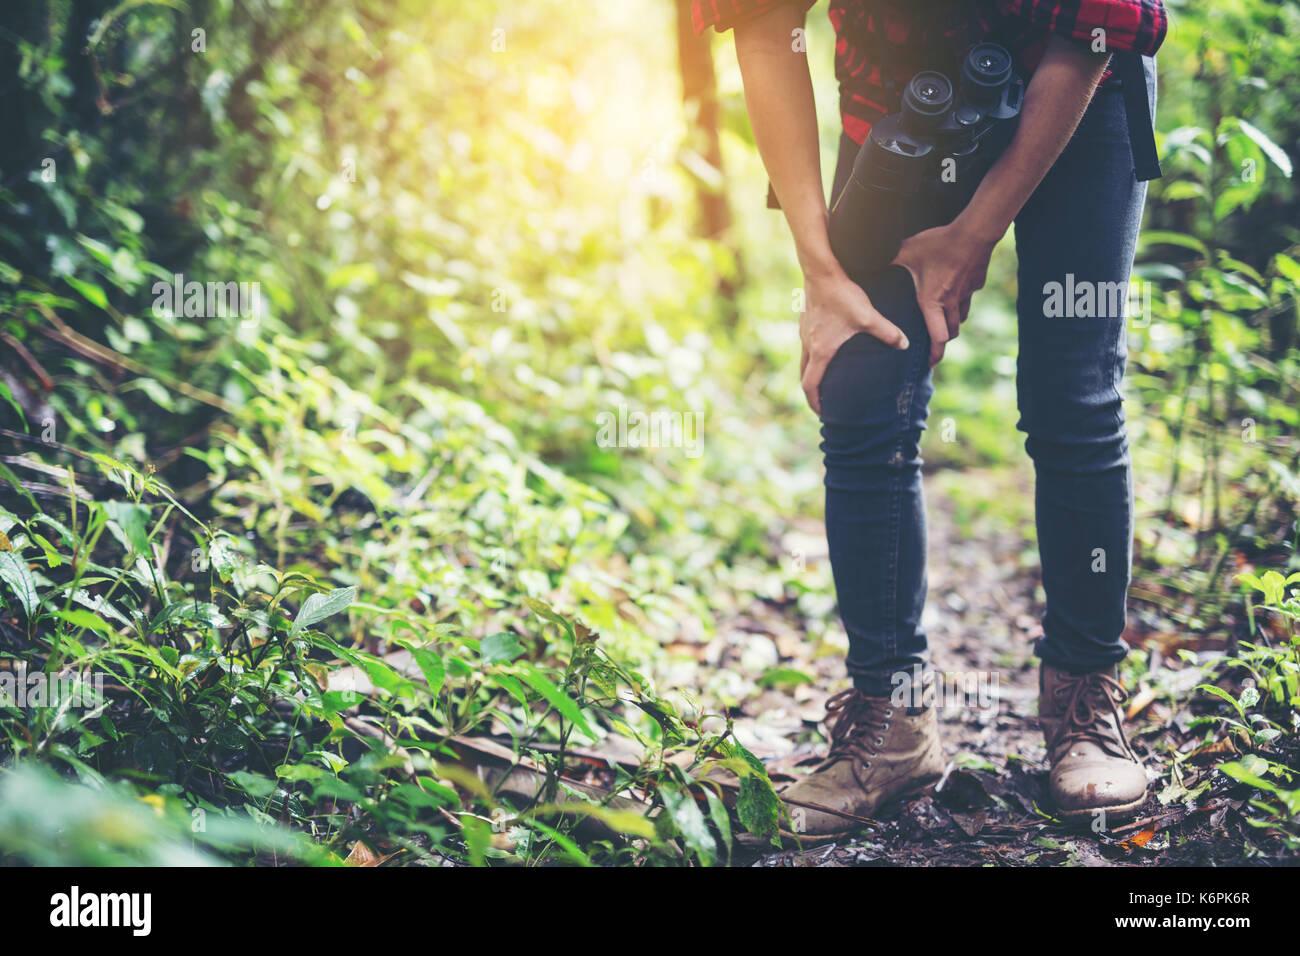 Hiking muscle pain. Stock Photo